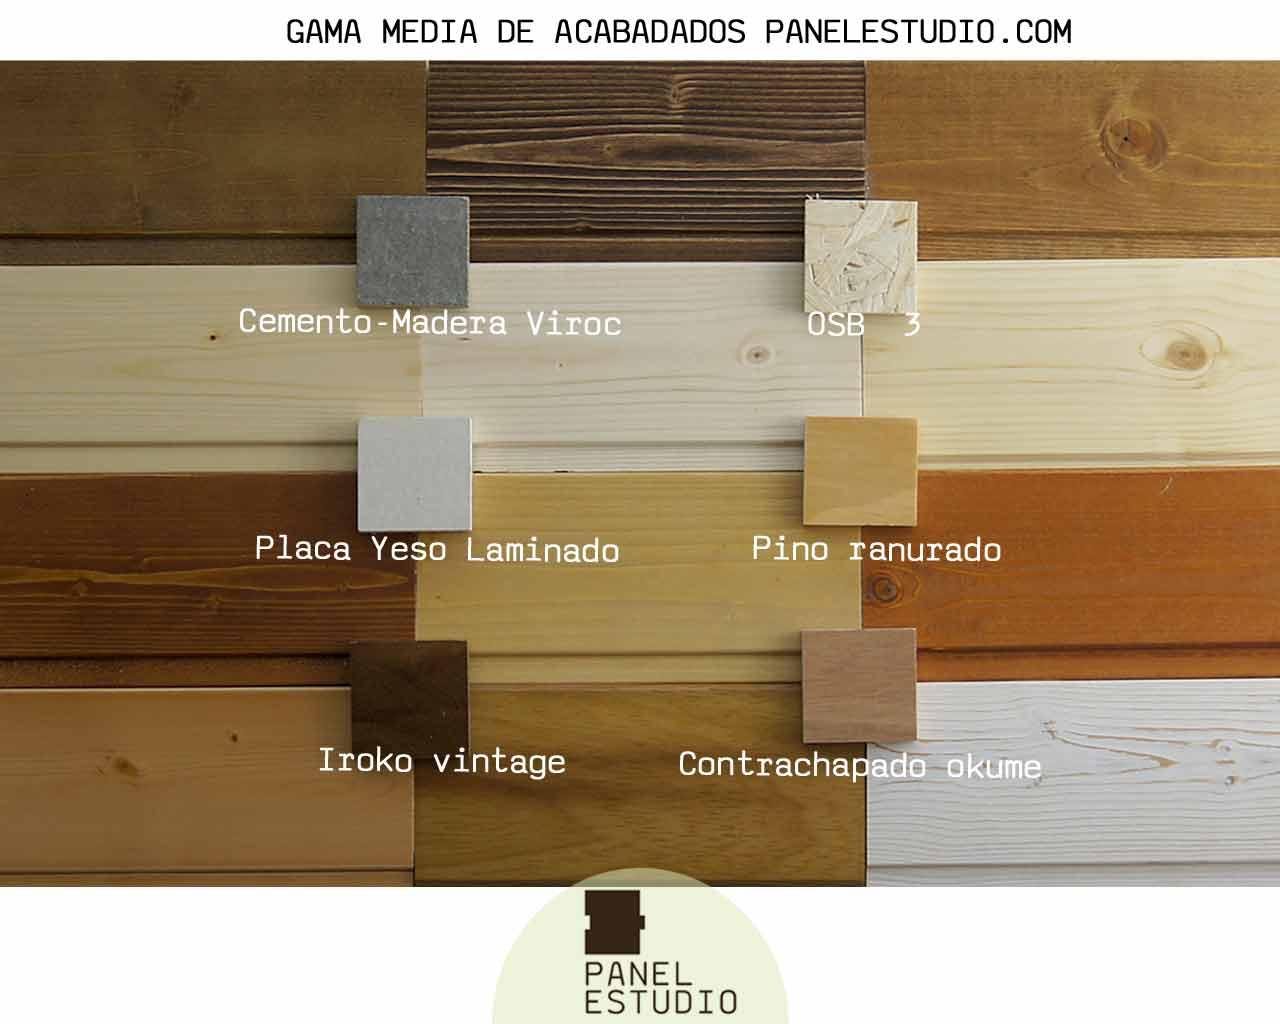 Panelestudio panel de madera aislante para cubiertas - Paneles madera exterior ...